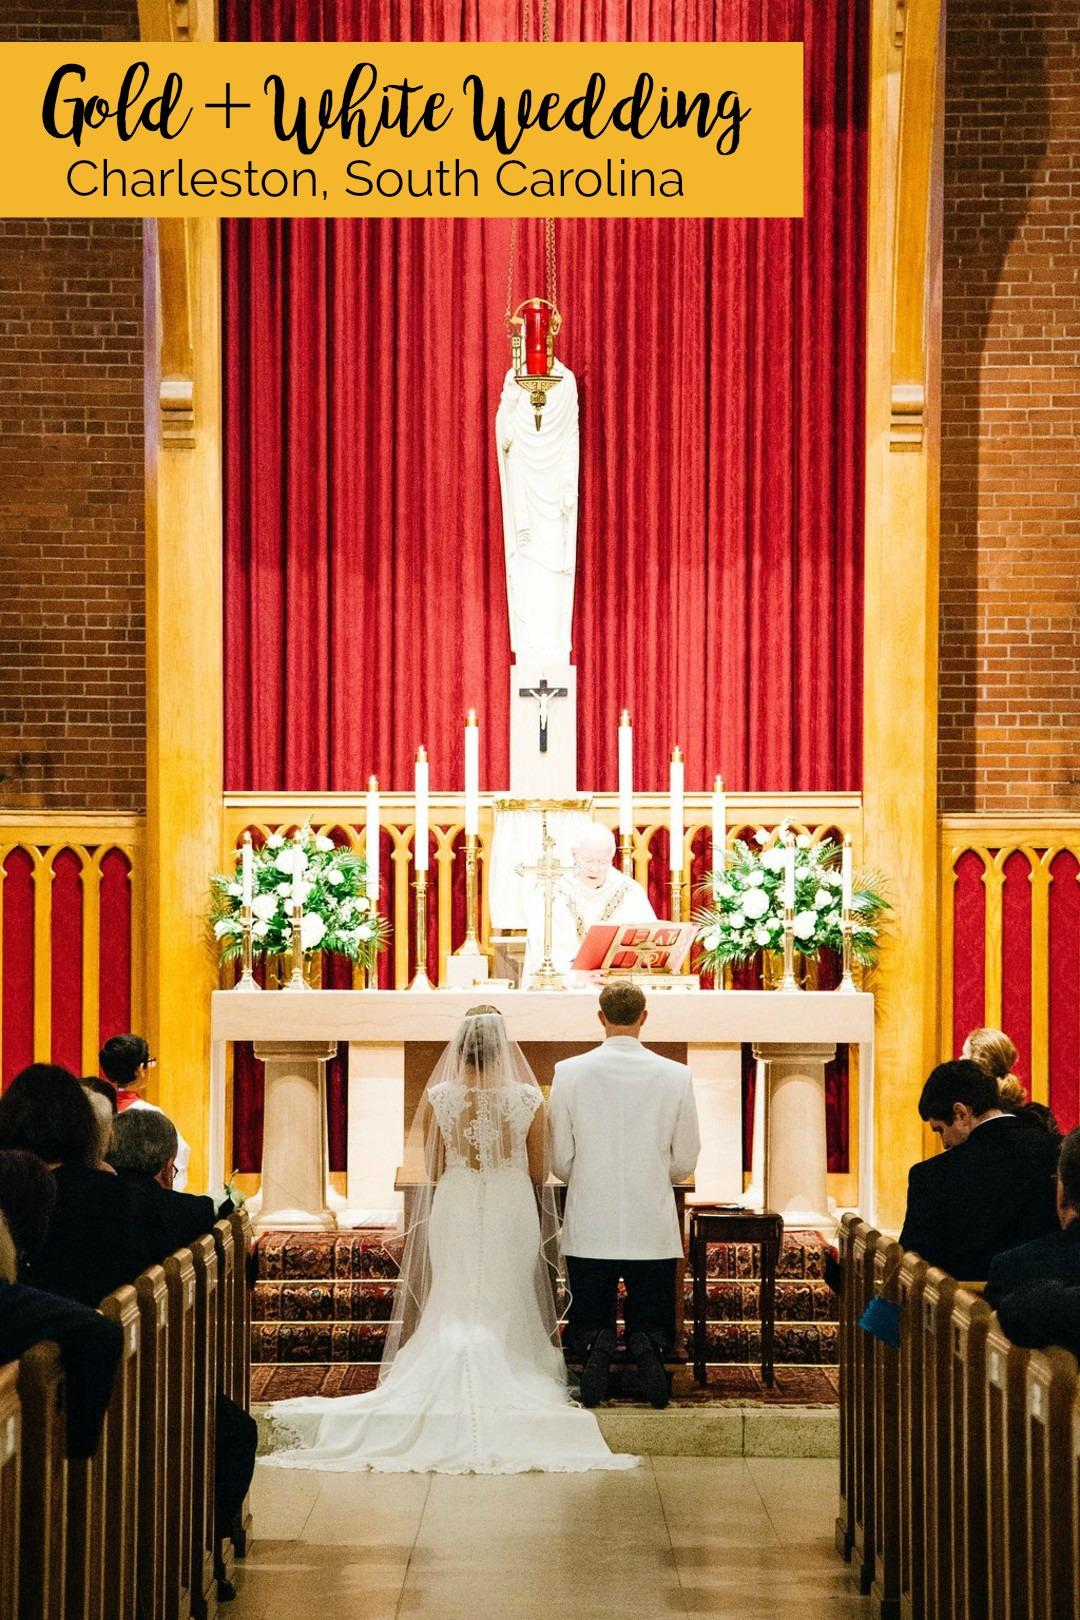 Frances and Steven: Teal and Gold Wedding at Sacred Heart Catholic Church, Charleston, South Carolina | Palmetto State Weddings | Cana Dunlap Photography | Charleston wedding